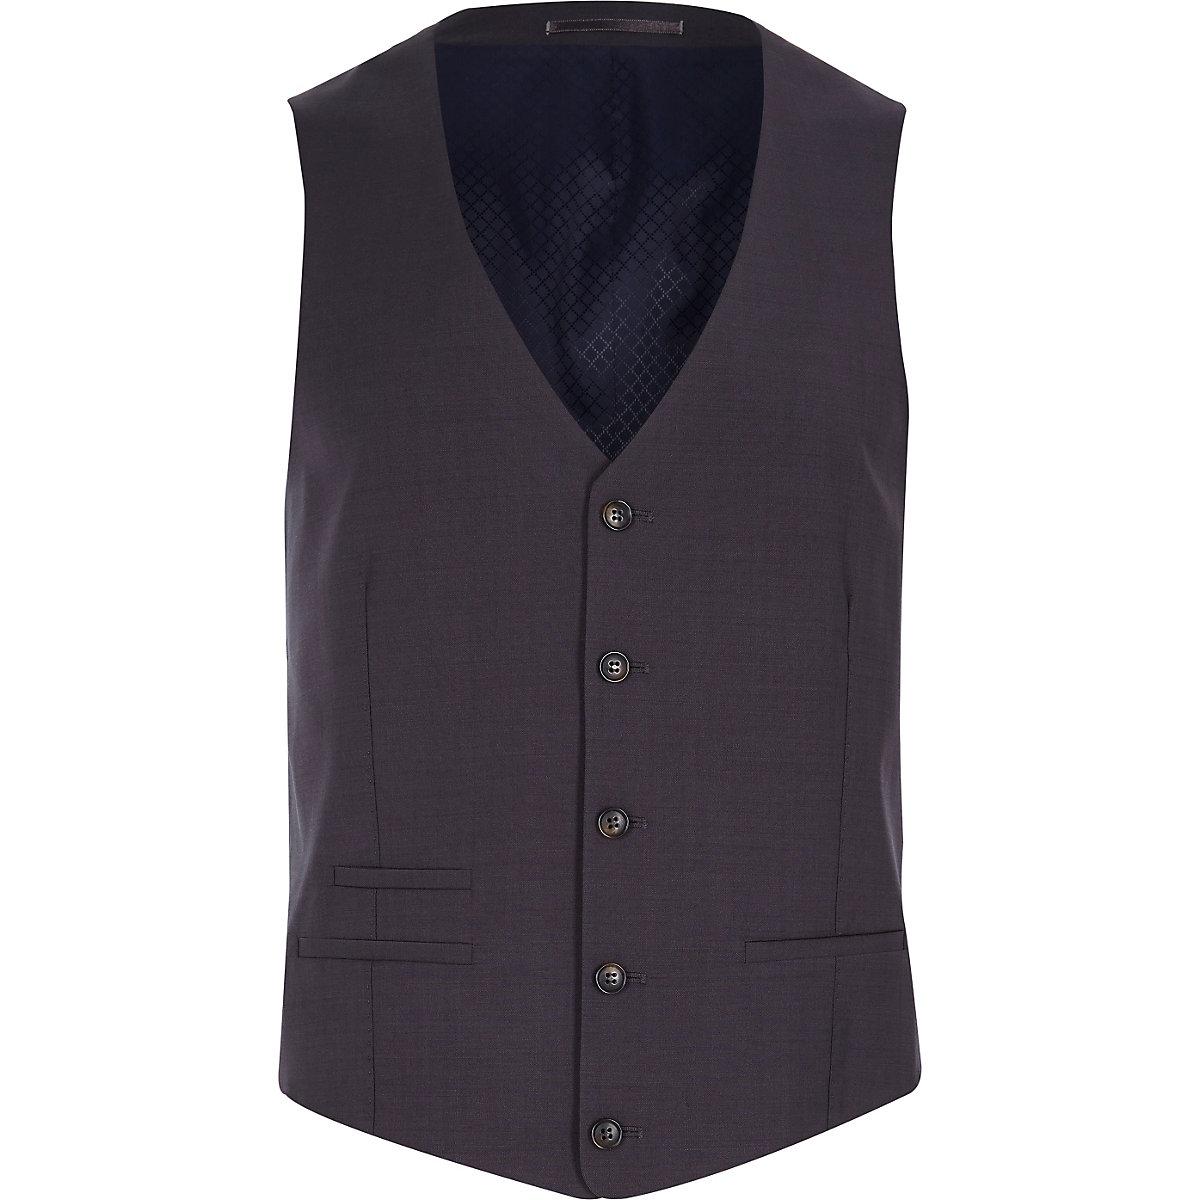 Grey wool-blend button front waistcoat